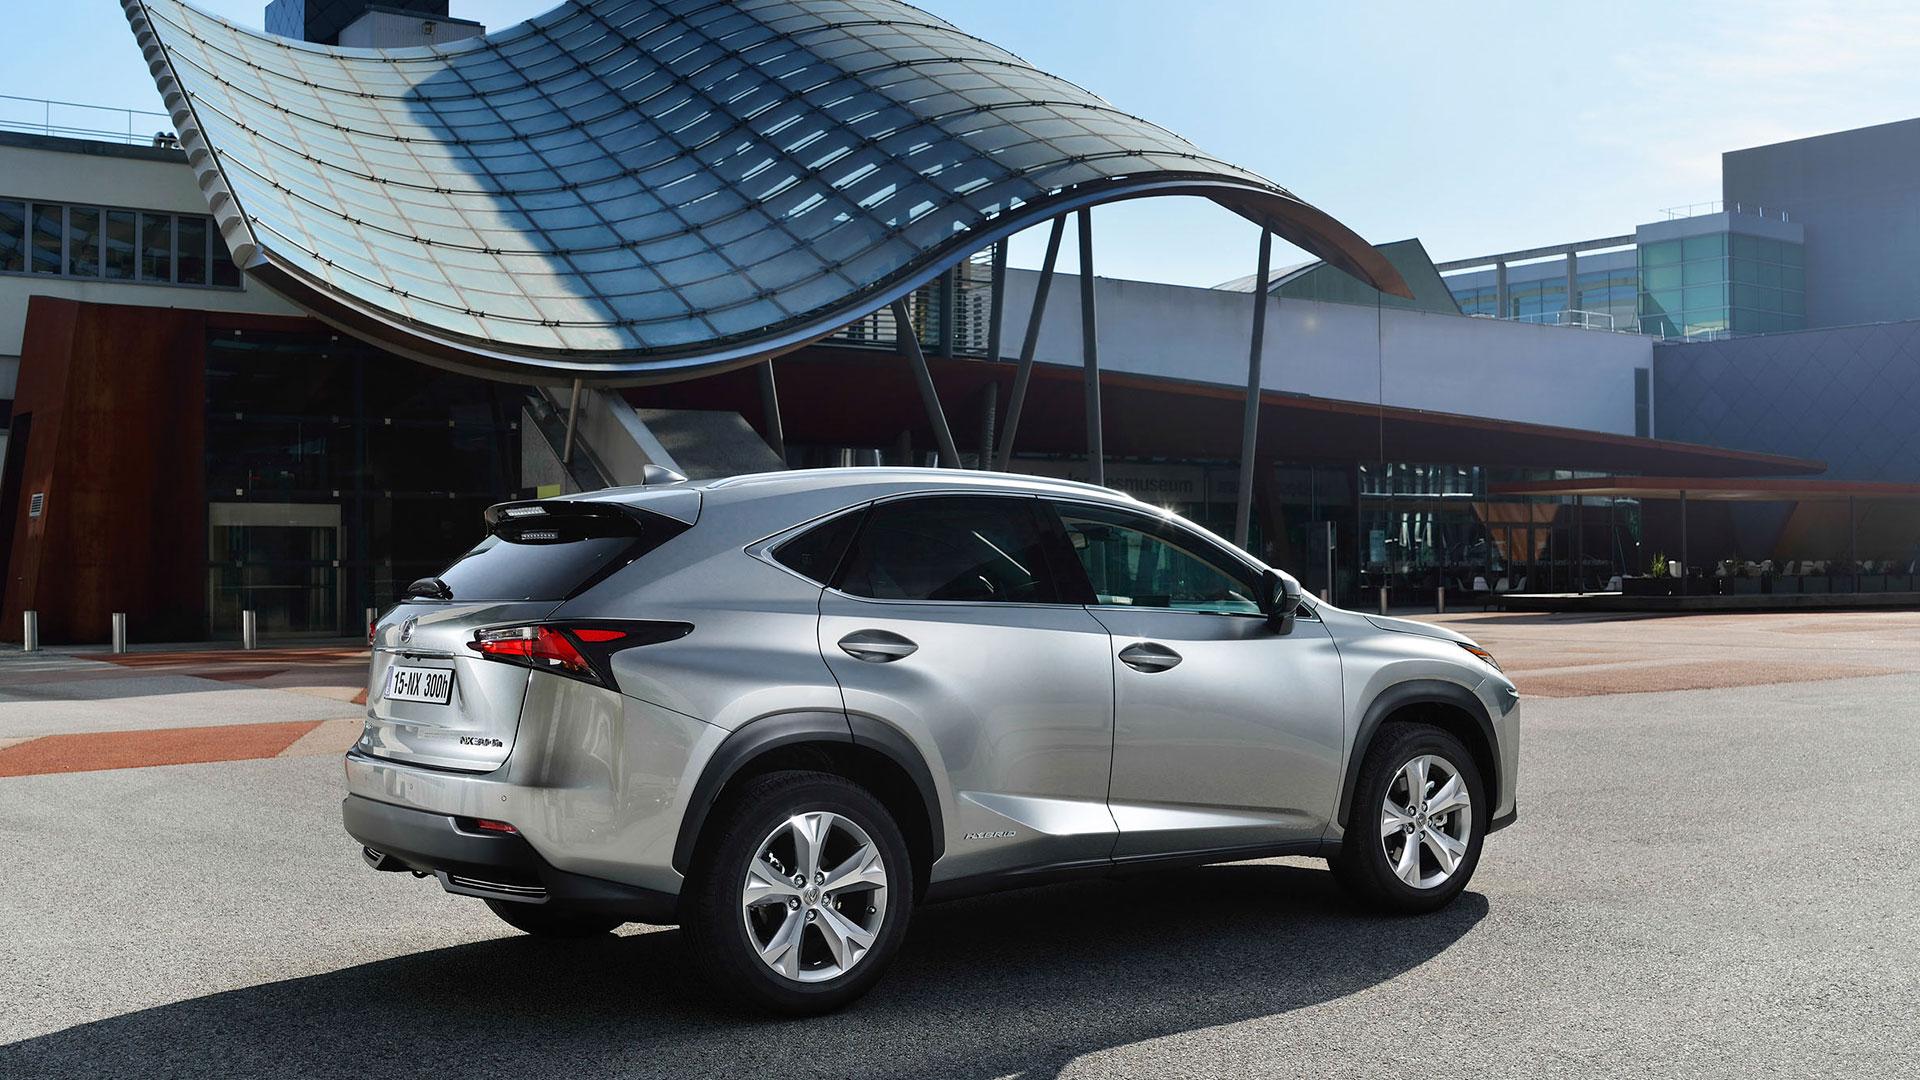 Novedades Lexus Barcelona hero asset